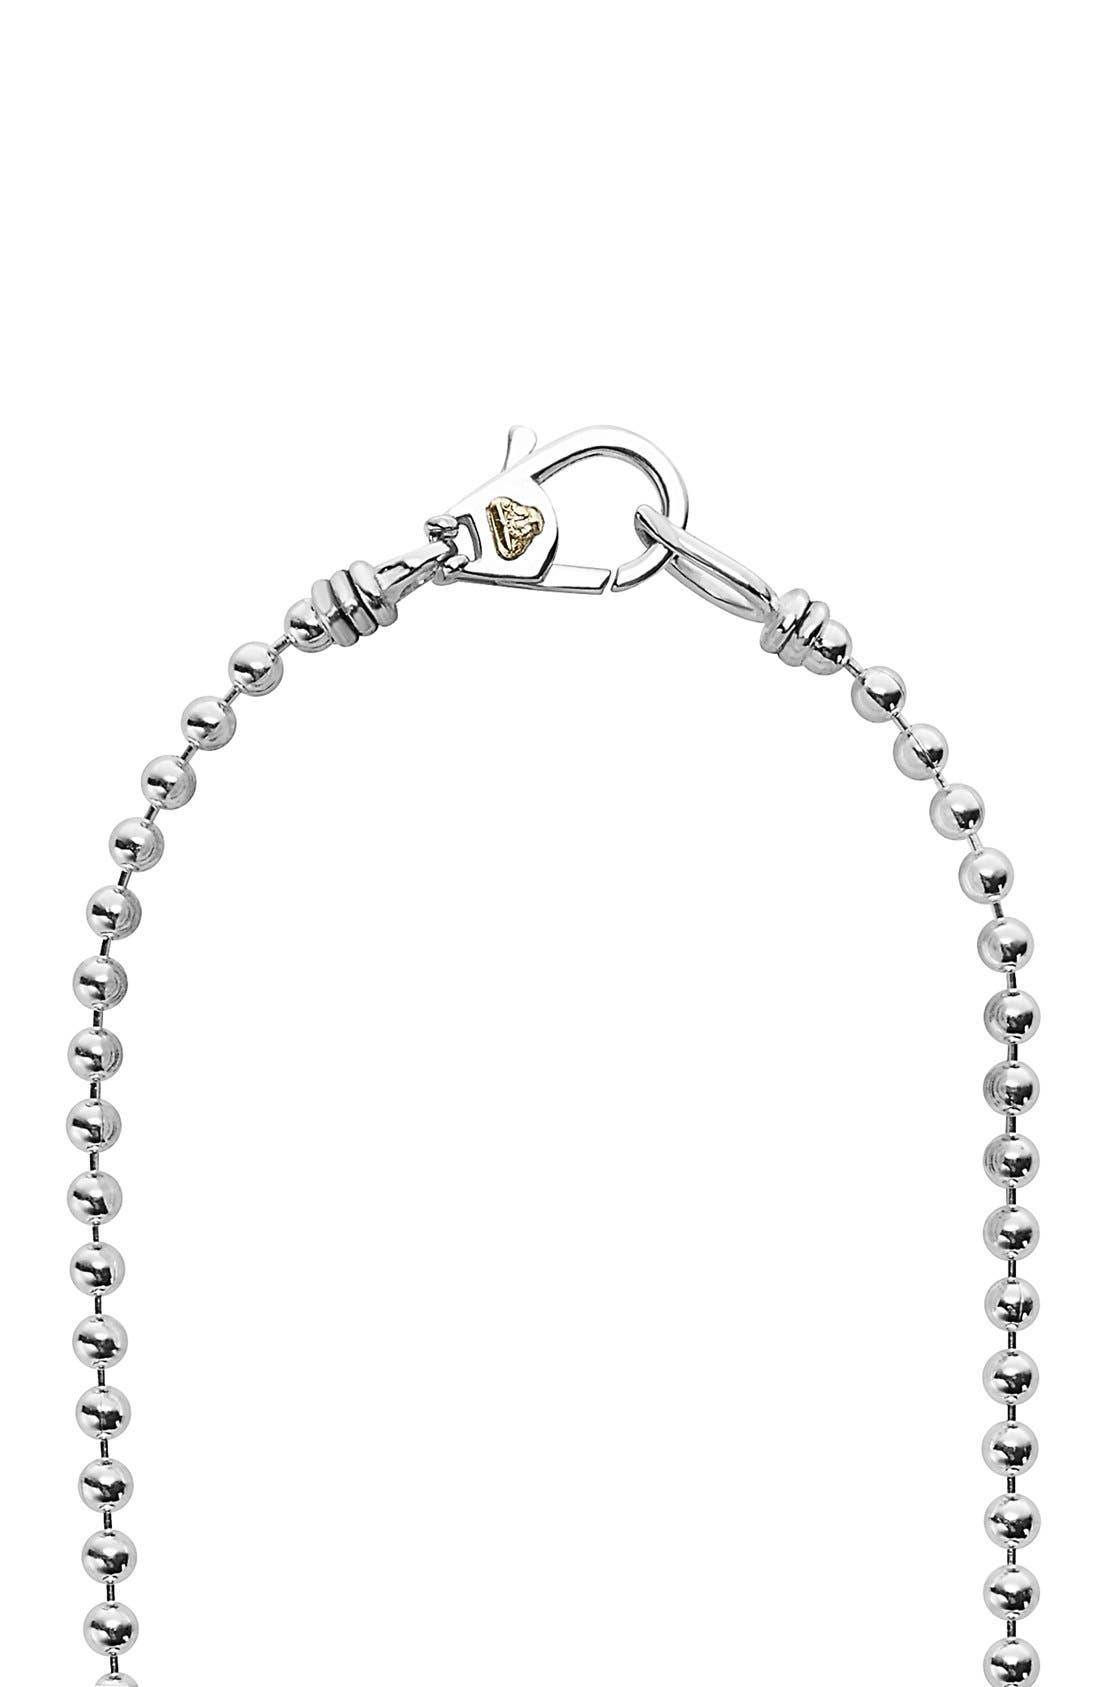 'Caviar Icon' Strand Necklace,                             Alternate thumbnail 4, color,                             SILVER/ GOLD